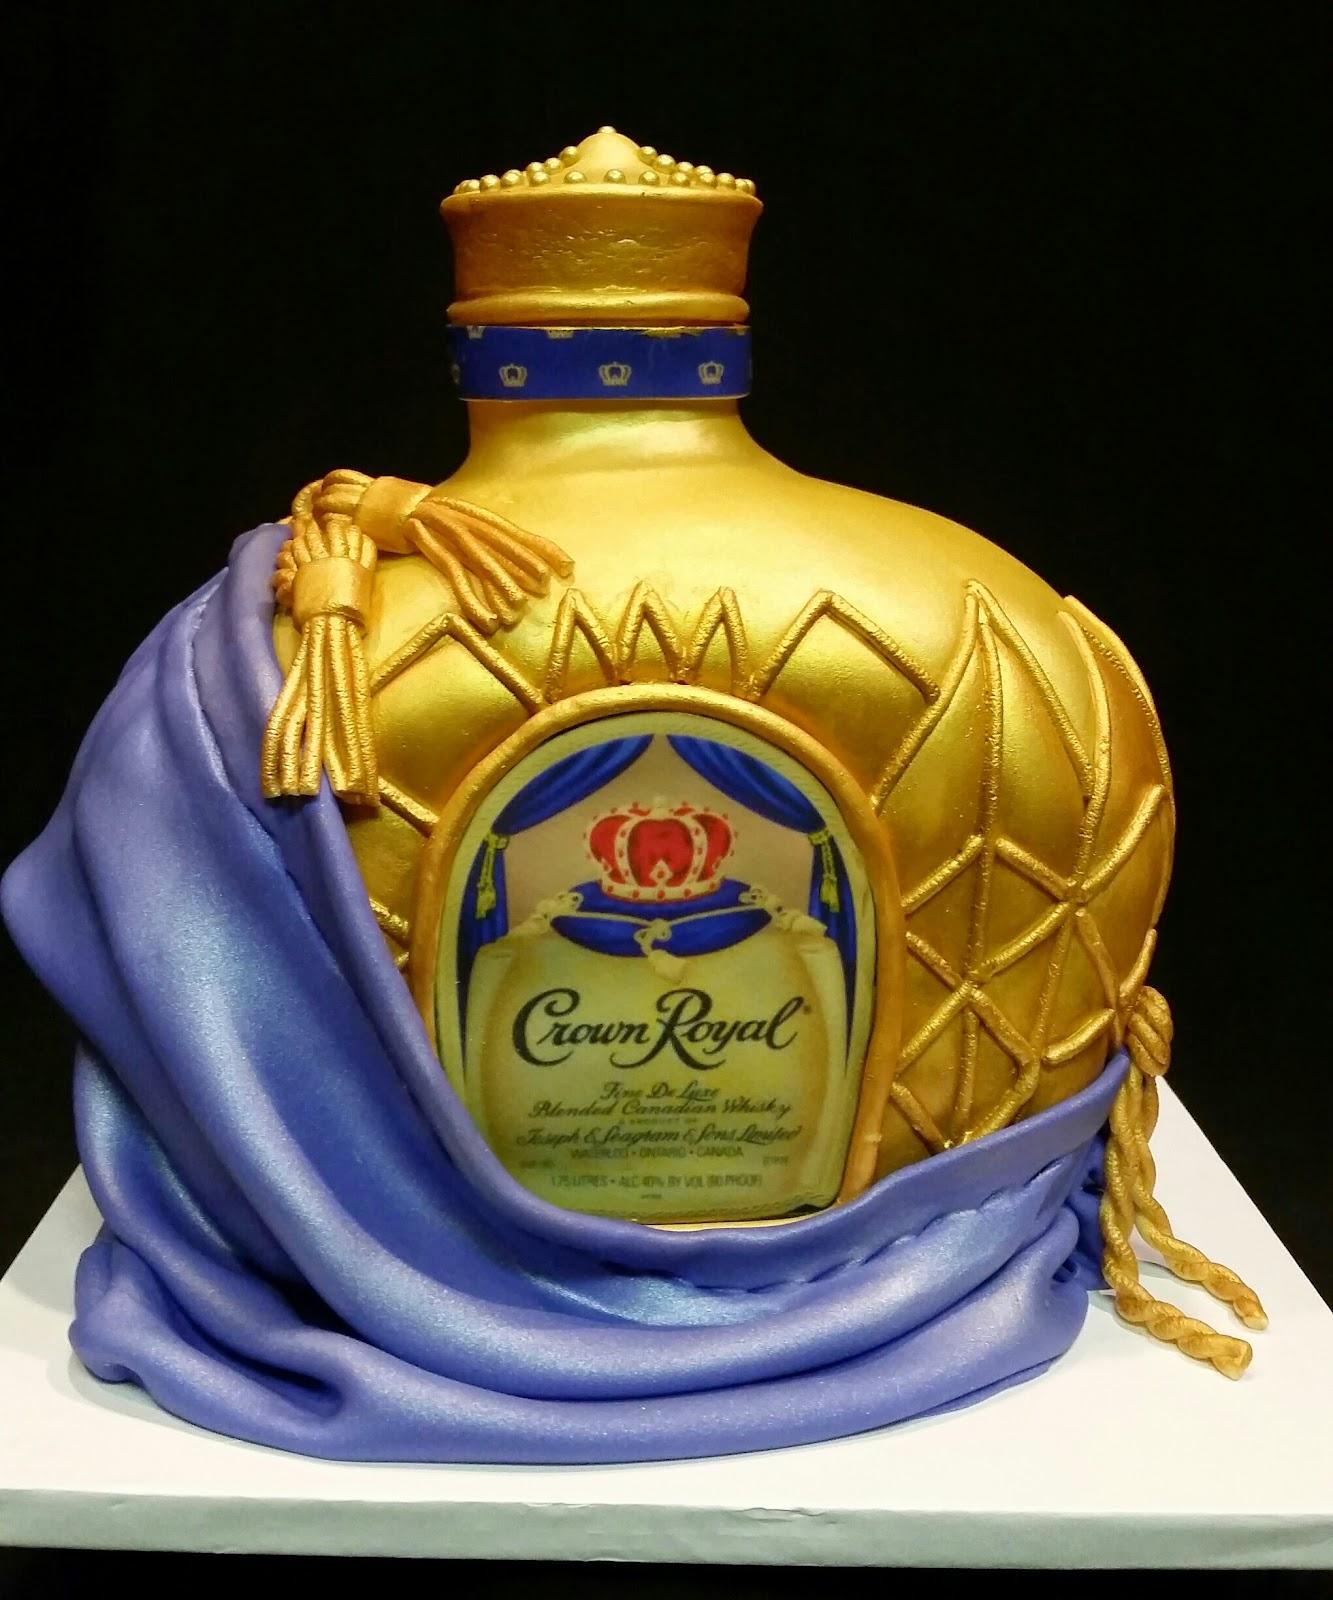 Cake With Crown Royal : MyMoniCakes: Crown Royal bottle cake